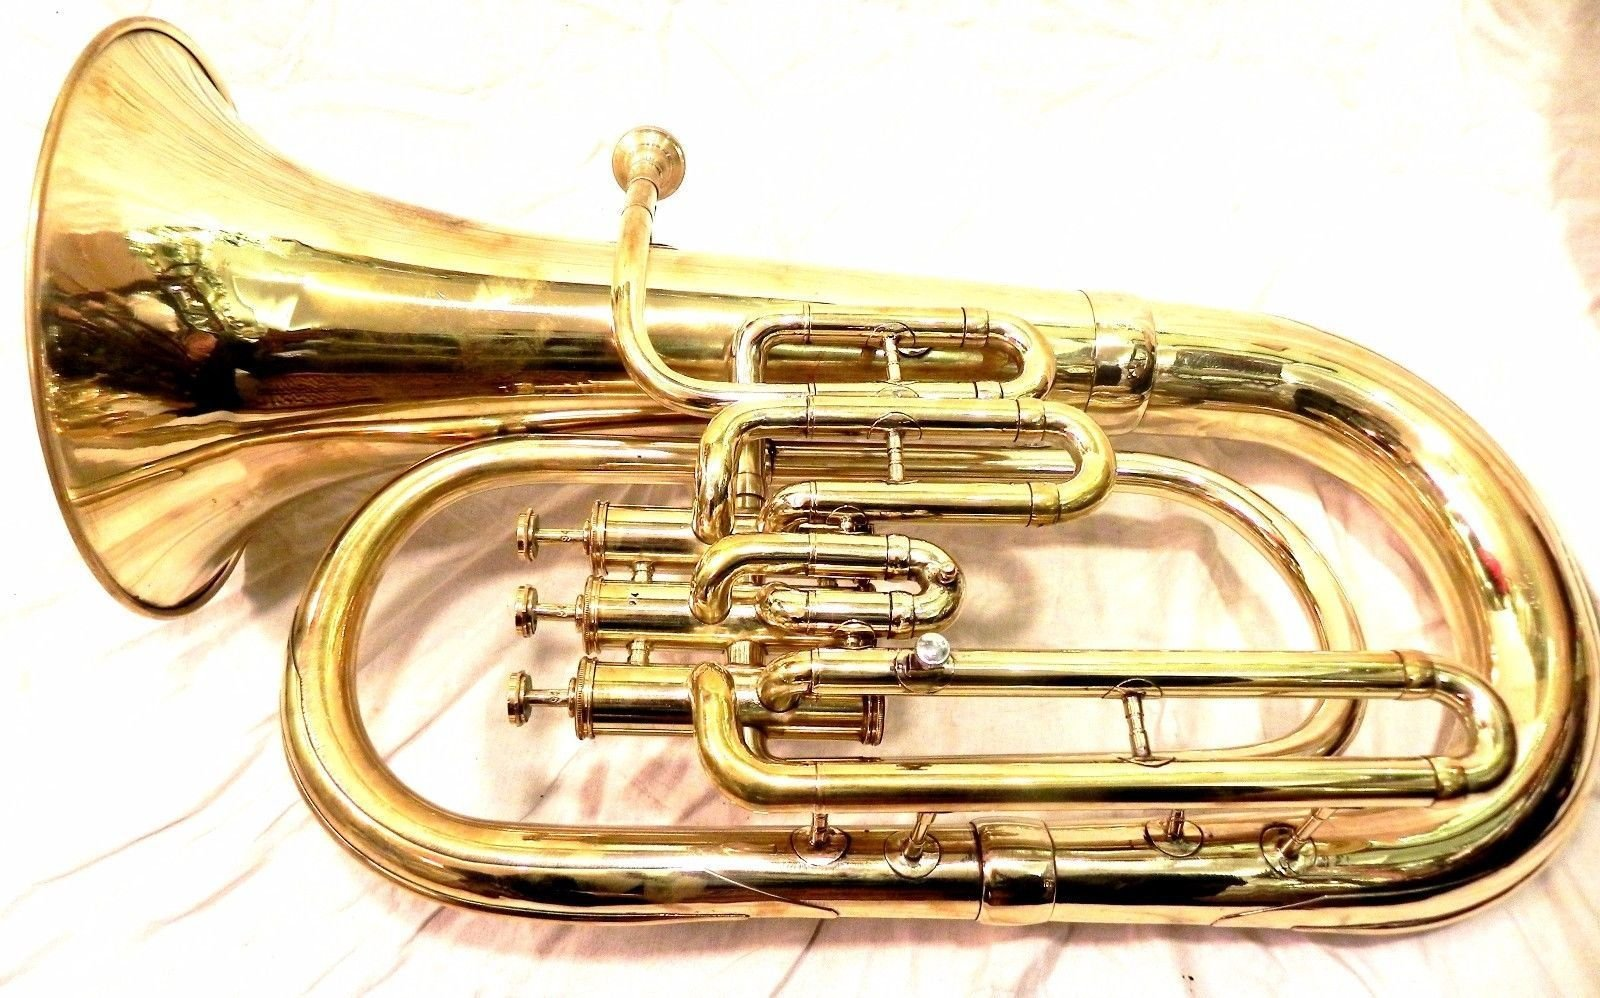 Euphonium Brass Polish 3 Valve euphonium & Mouth Piece with Bag tuba